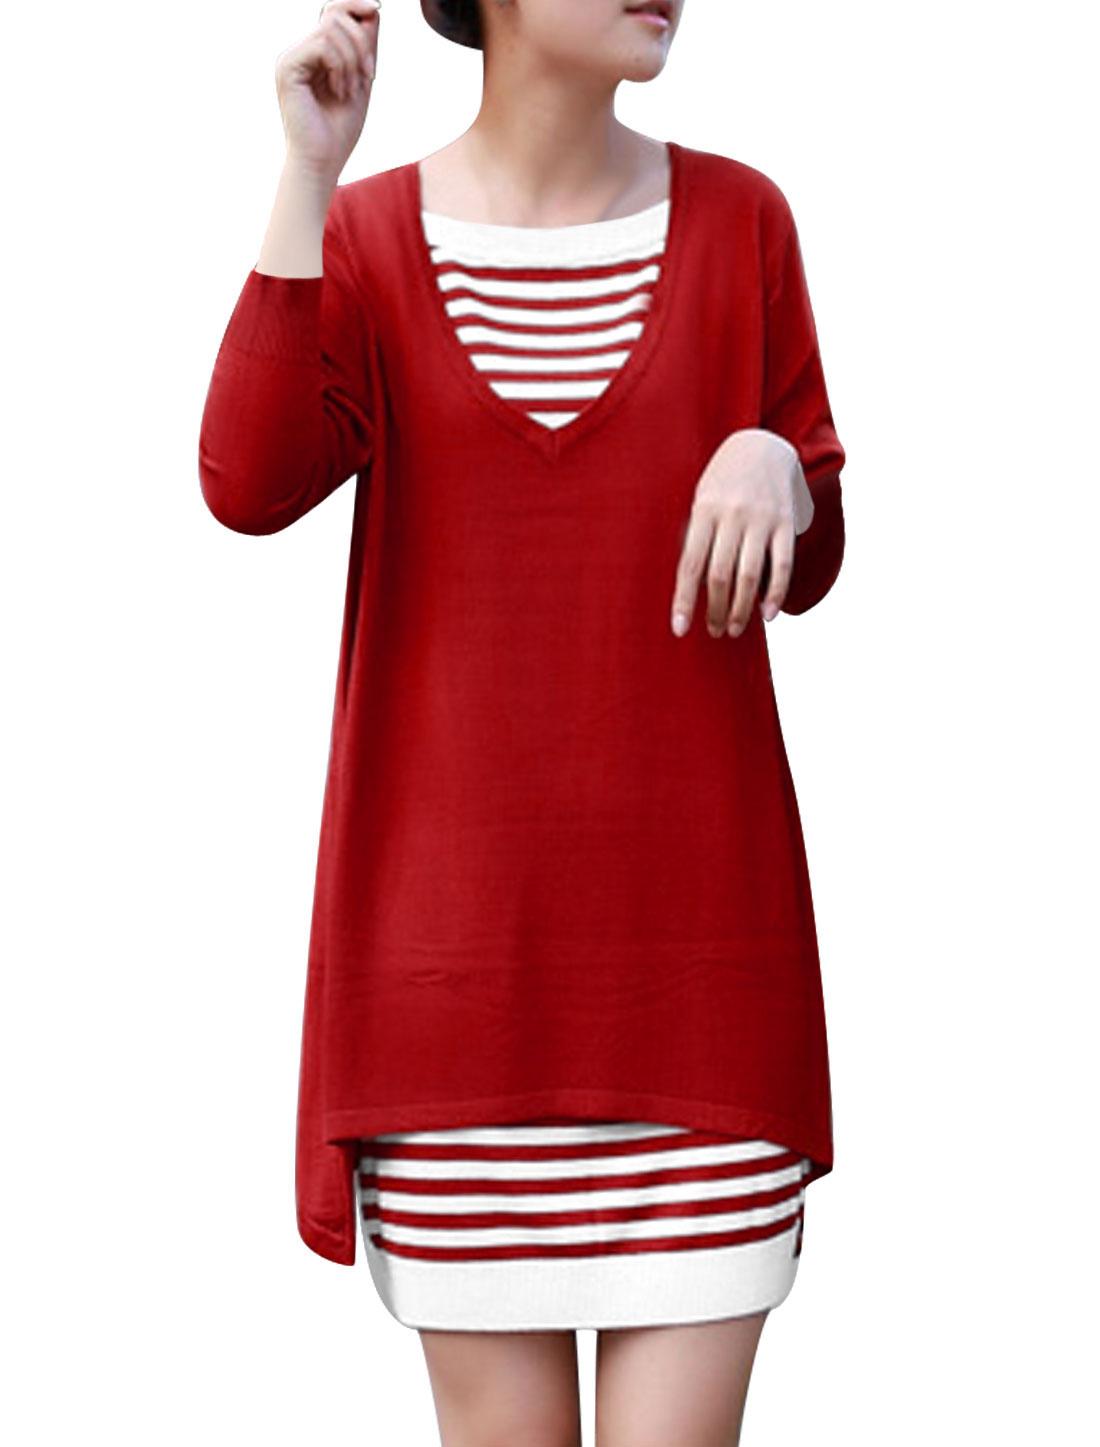 Women V Neck Split Back Top w Sleeveless Stripes Knit Dress Set Red White XS